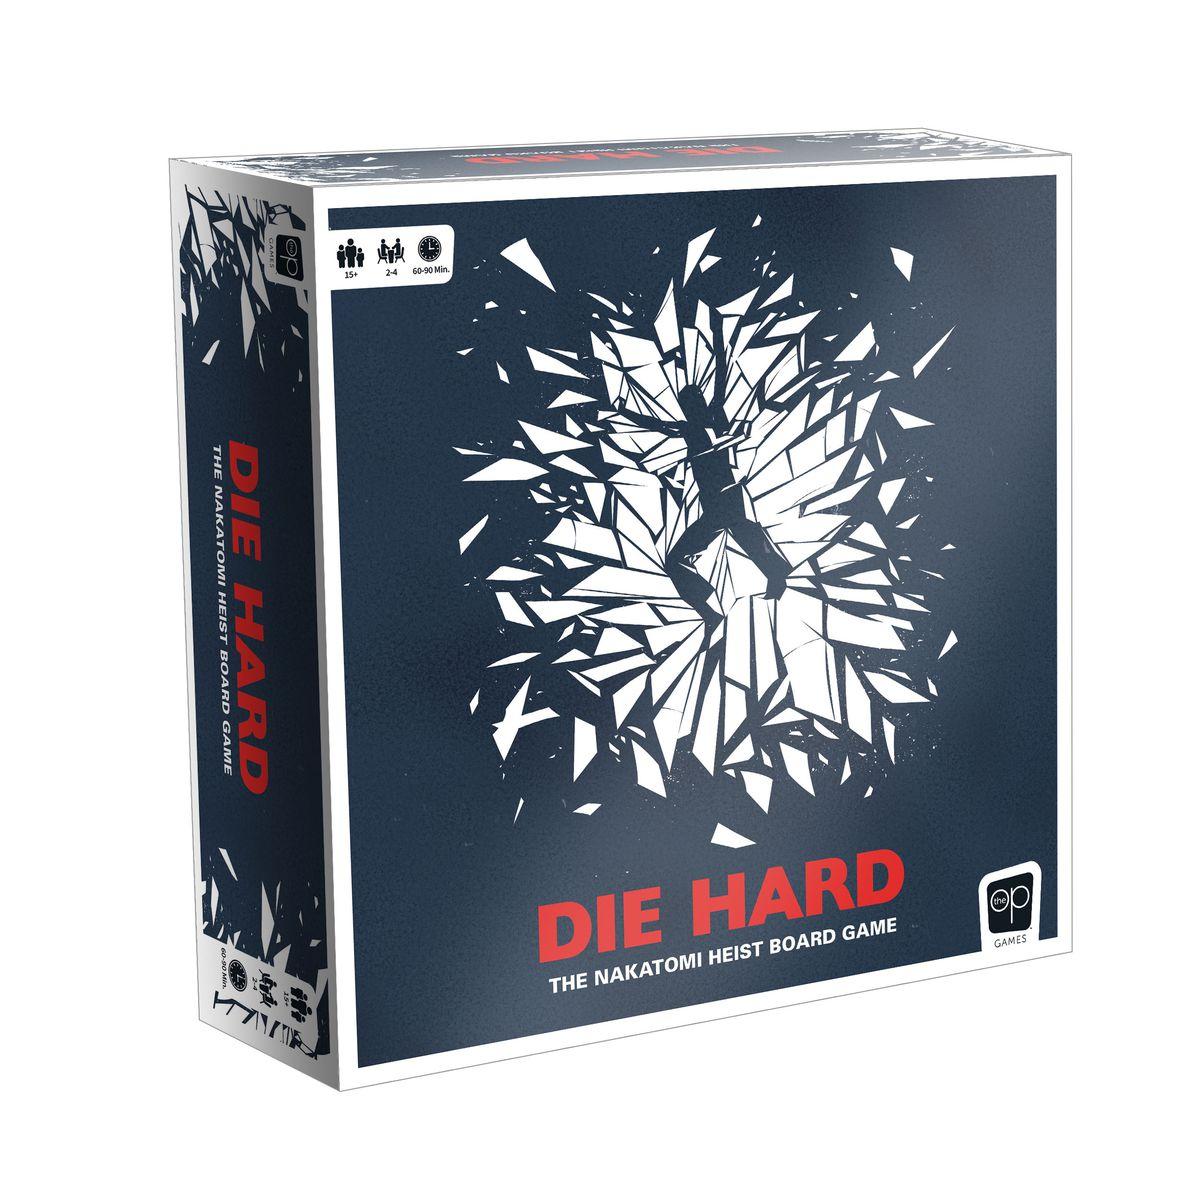 A mockup of the box art for Die Hard: The Nakatomi Heist Board Game.